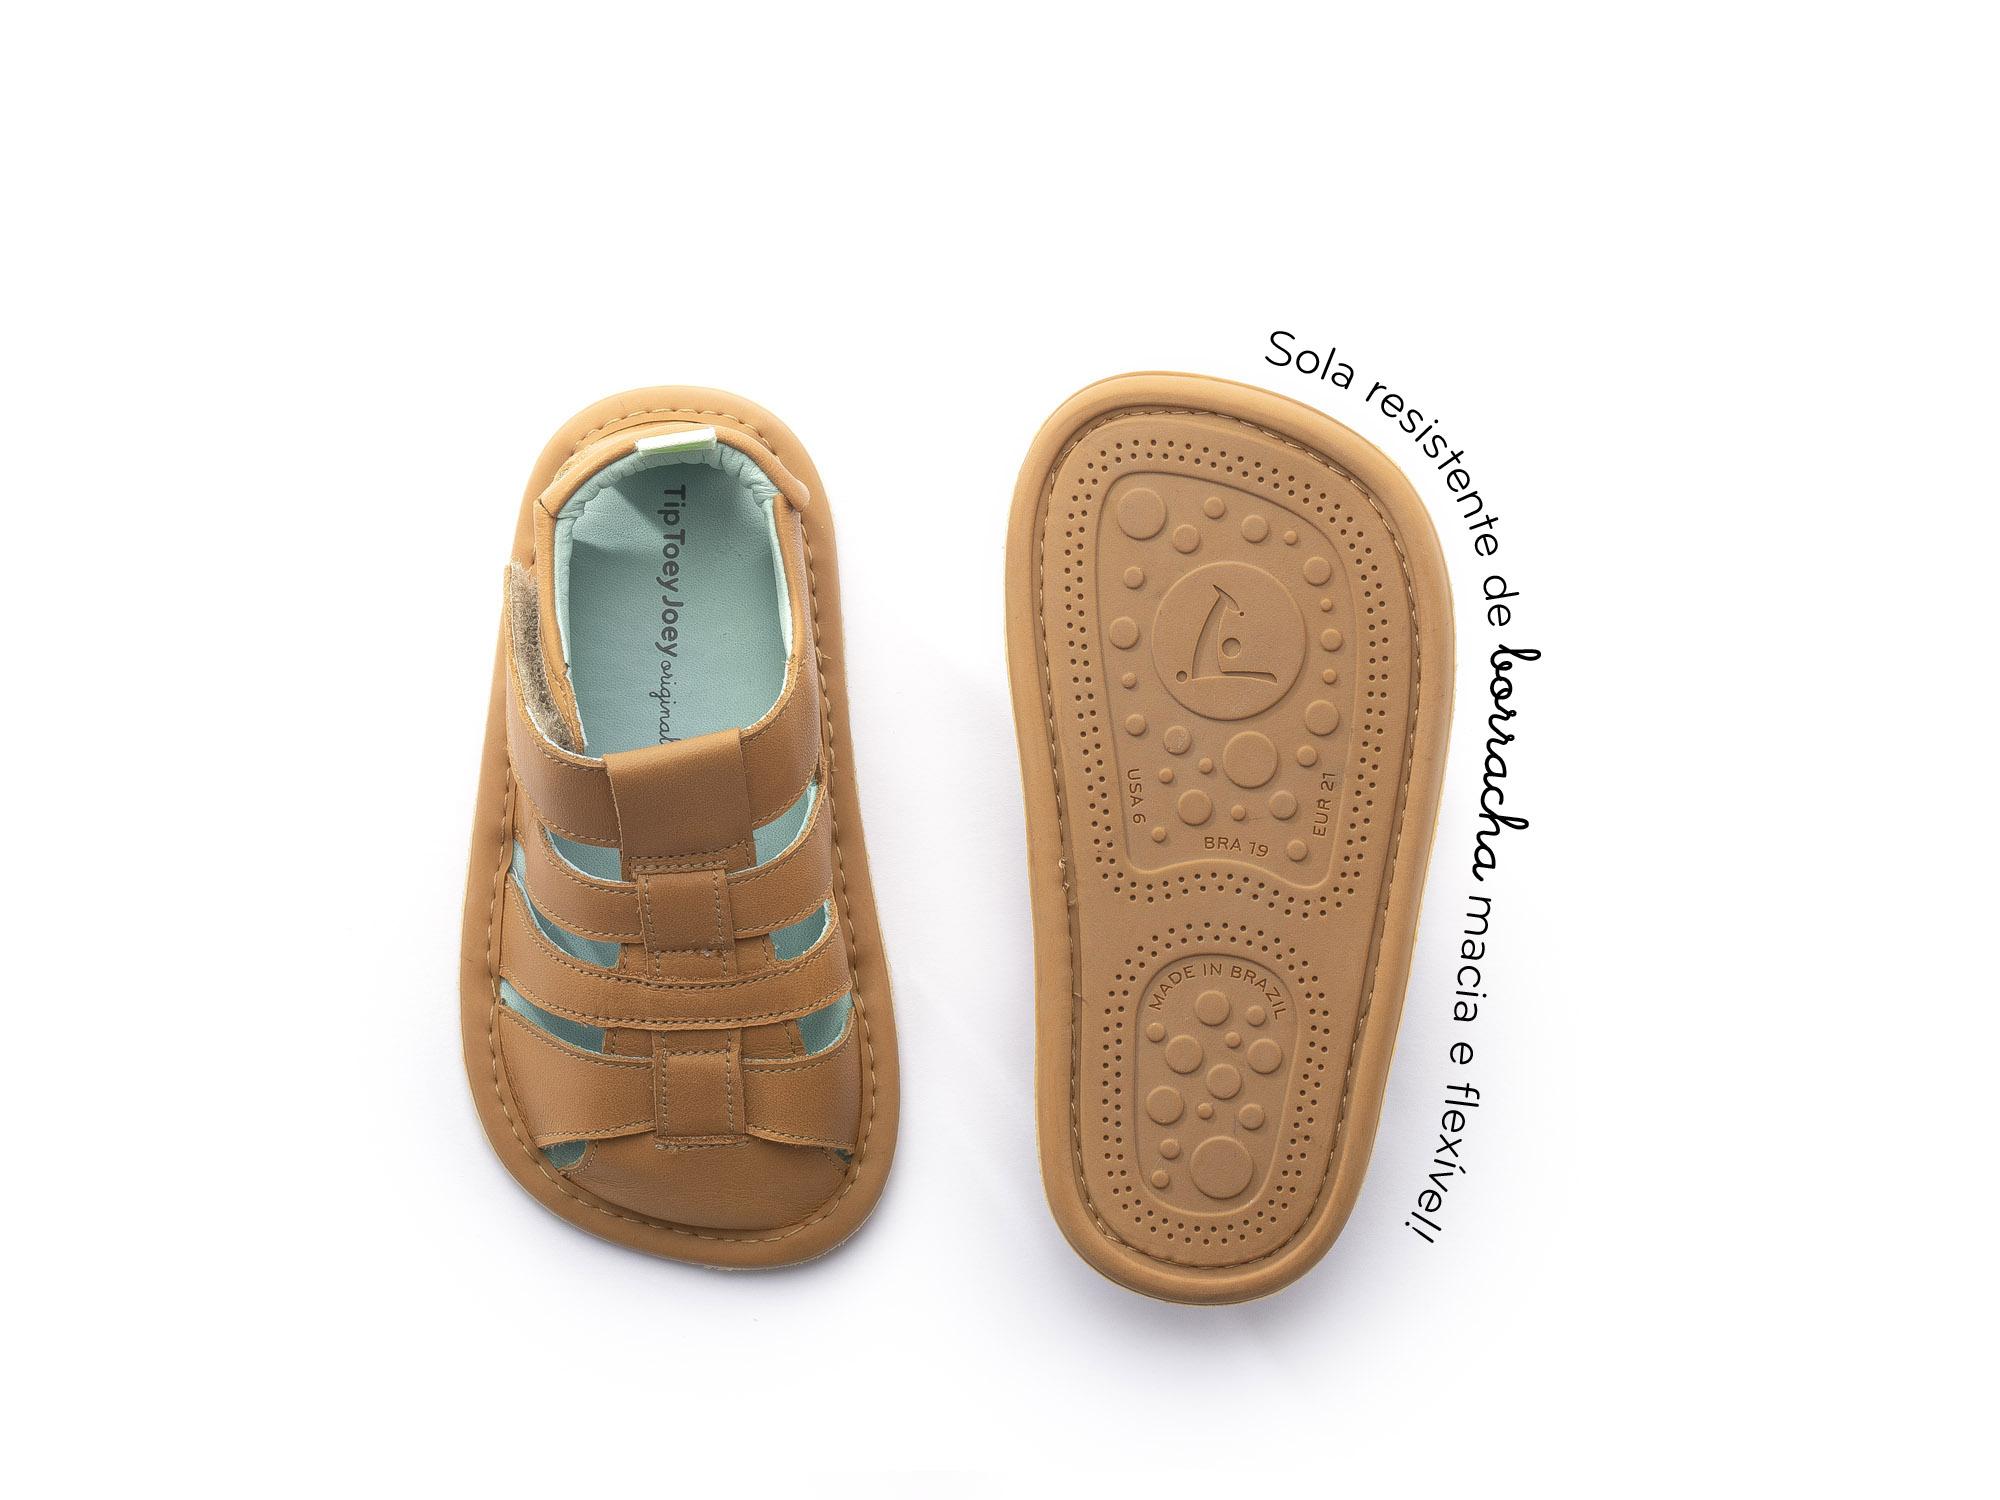 Sandália Sandy Hay Baby 0 à 2 anos - 1